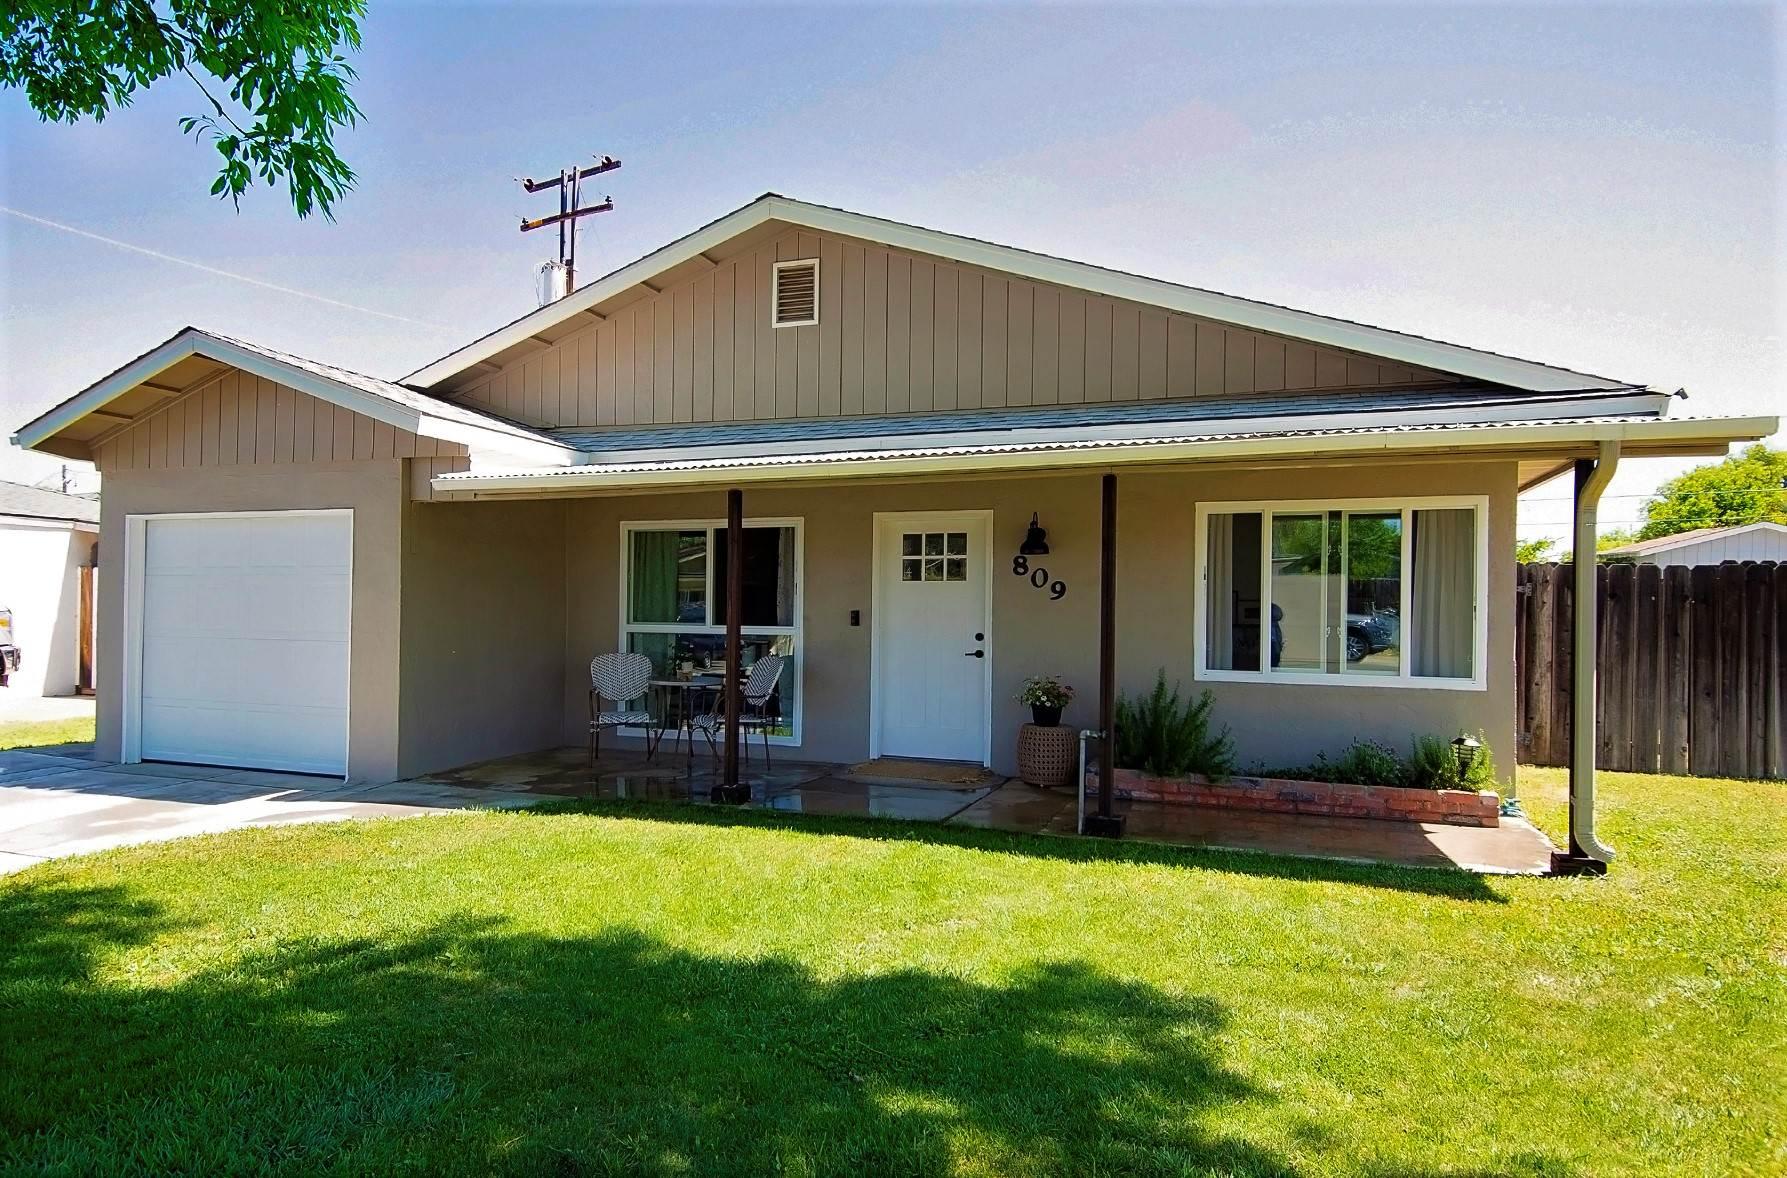 809 Lincoln Street, Winters, CA 95694